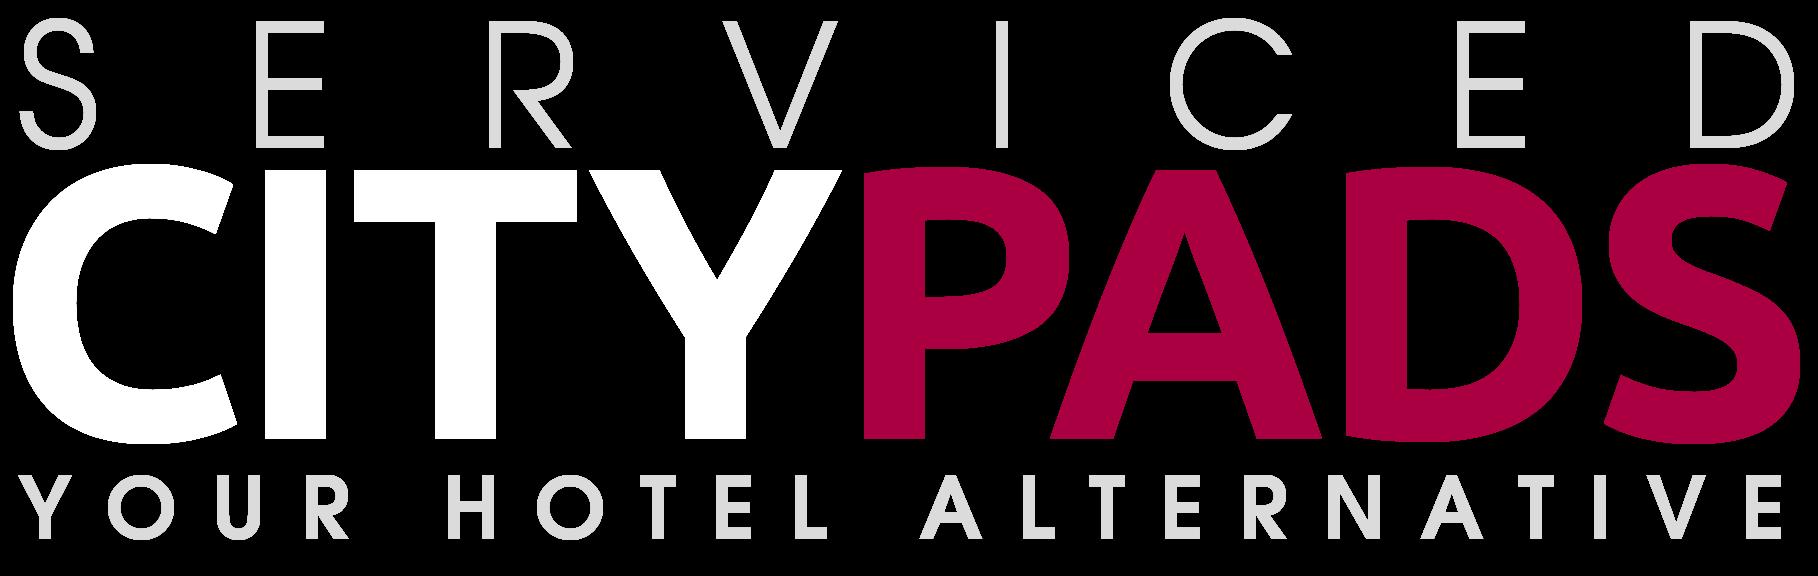 Serviced City Pads Logo